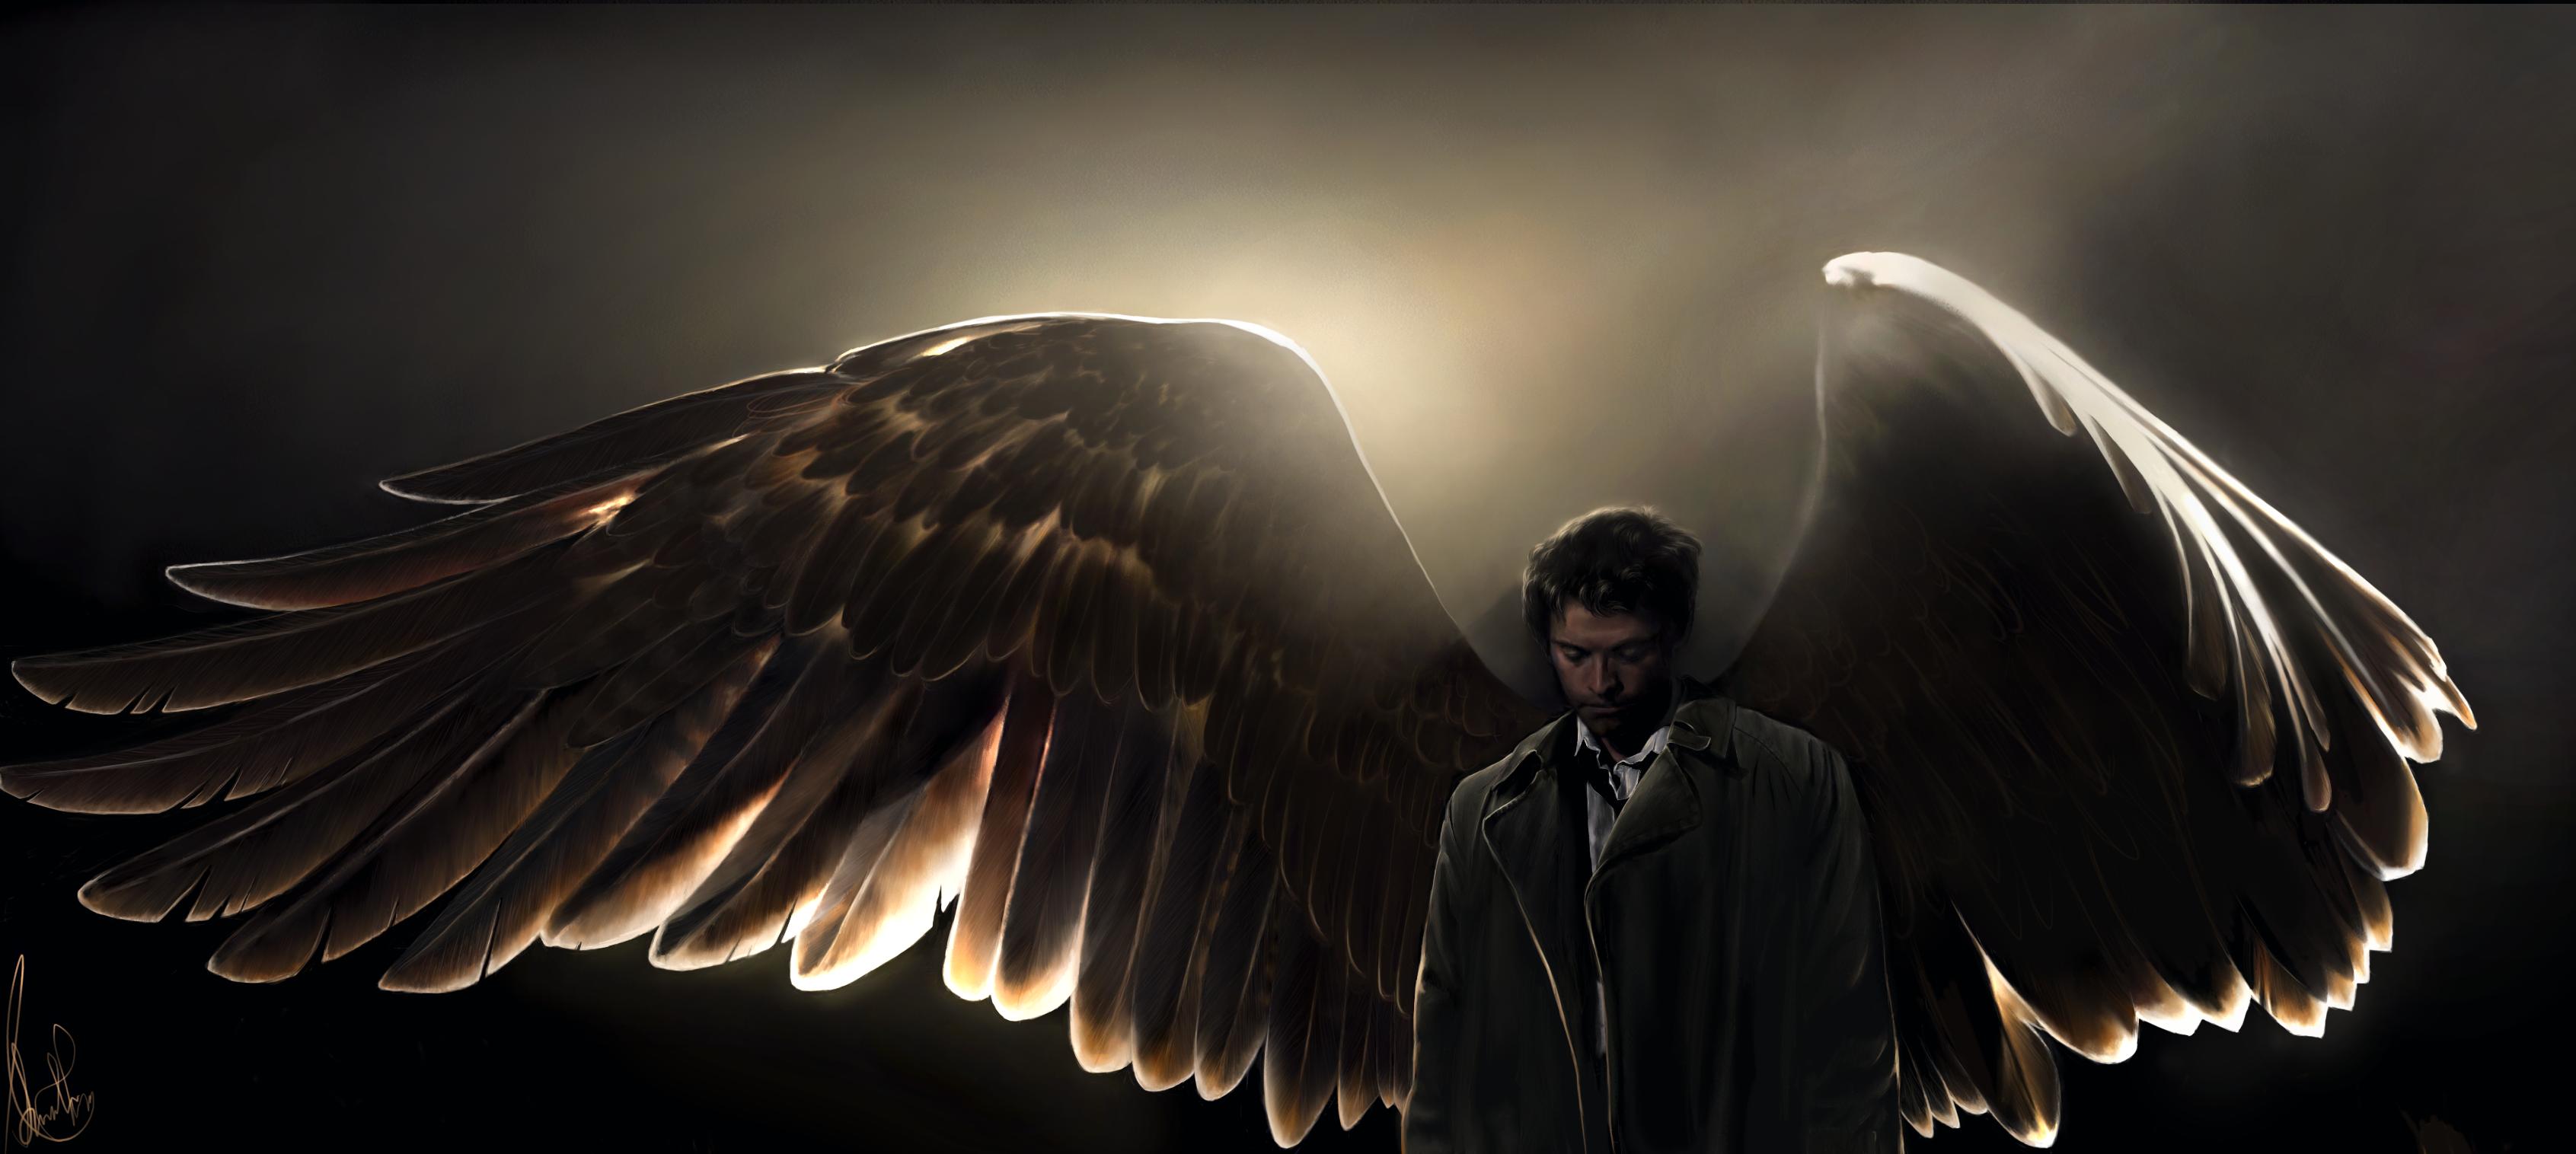 Castiel by AmandaTolleson